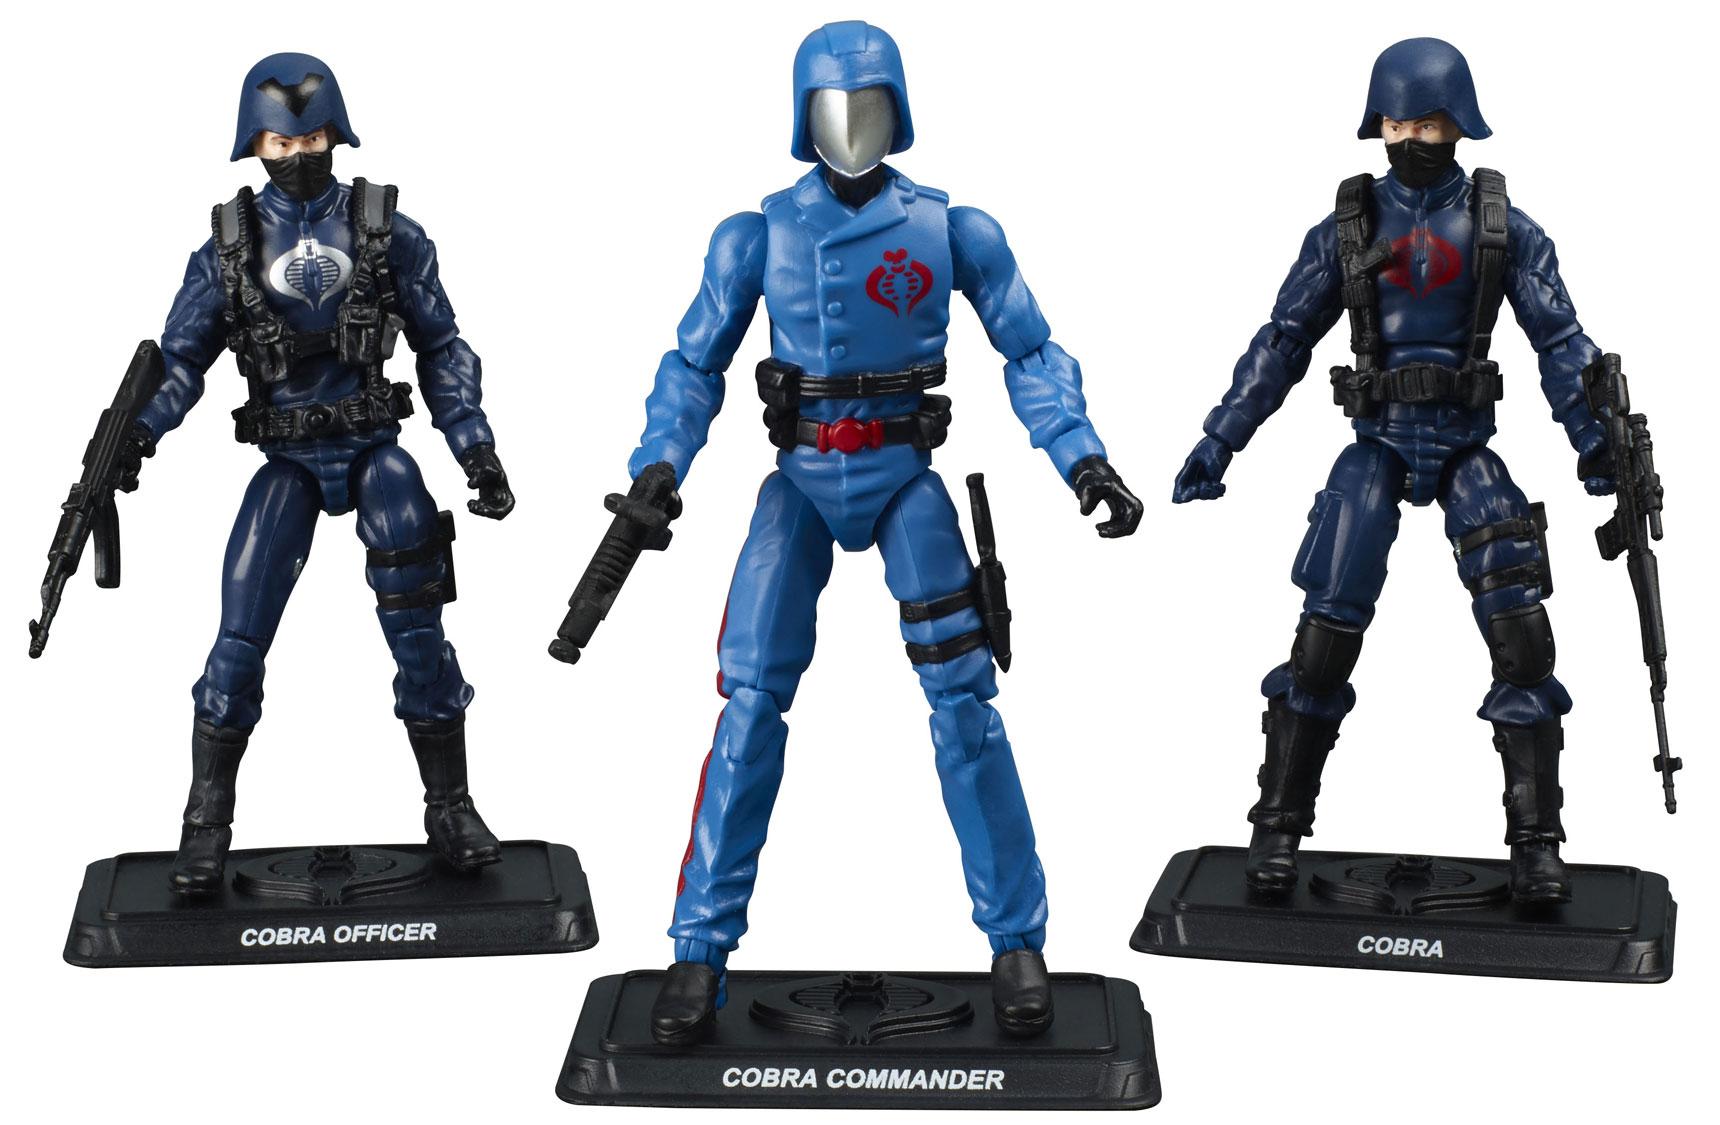 gi-joe-cobra-missile-command-headquarters-sdcc-2017-exclusive-figures